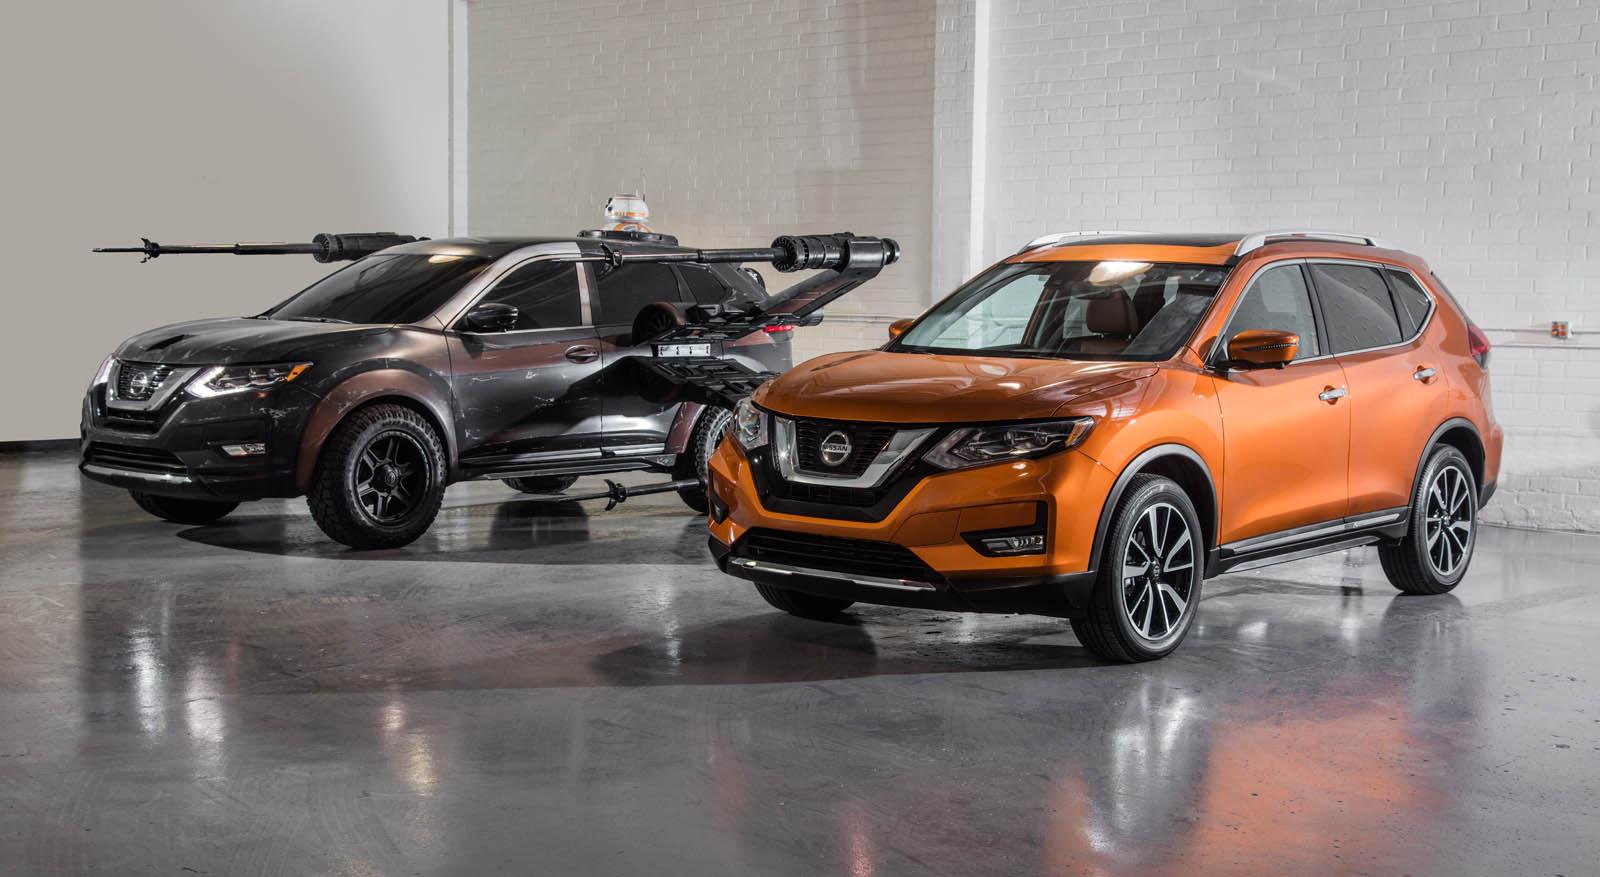 Car Wars: Nissan Gets Into The Star Wars Spirit With Six 'Last Jedi